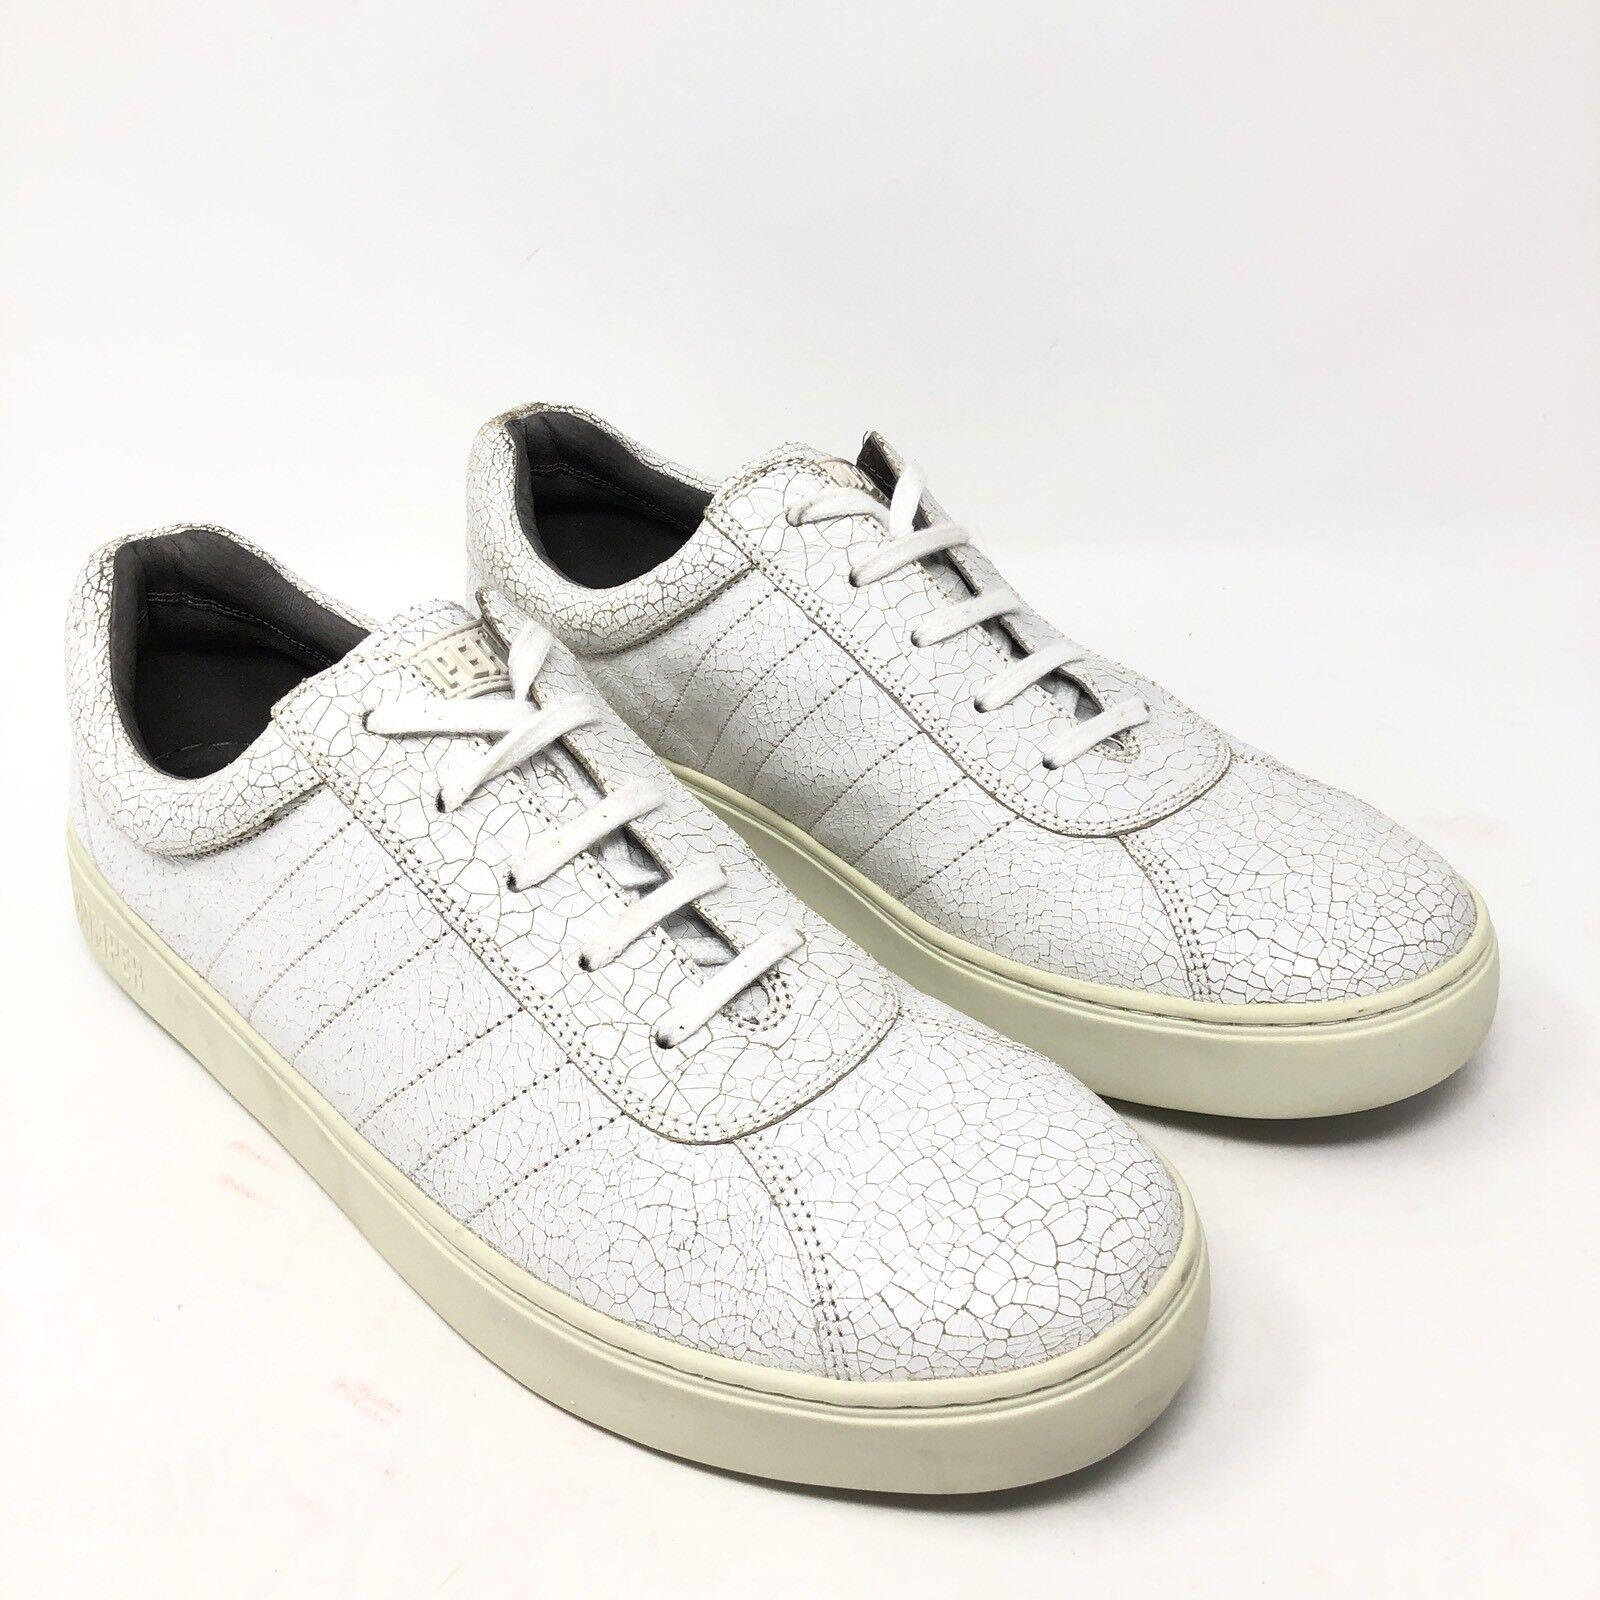 Camper Pelotas 87 White Crackle Pelle Lo Fashion  Shoes Uomo Size 45/12